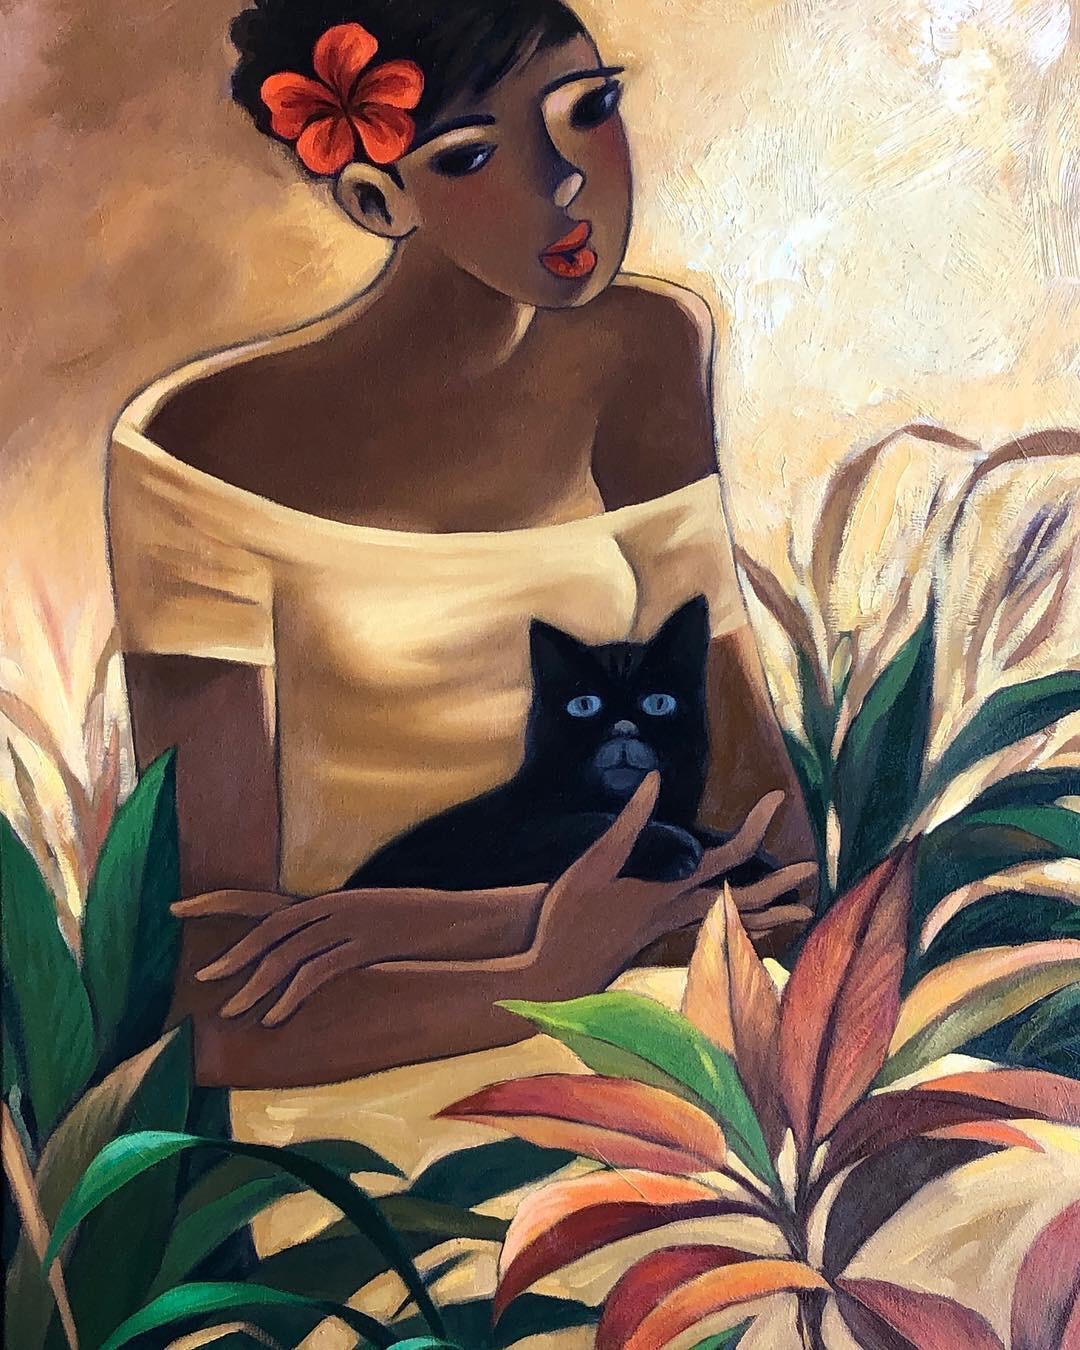 Black Kitty